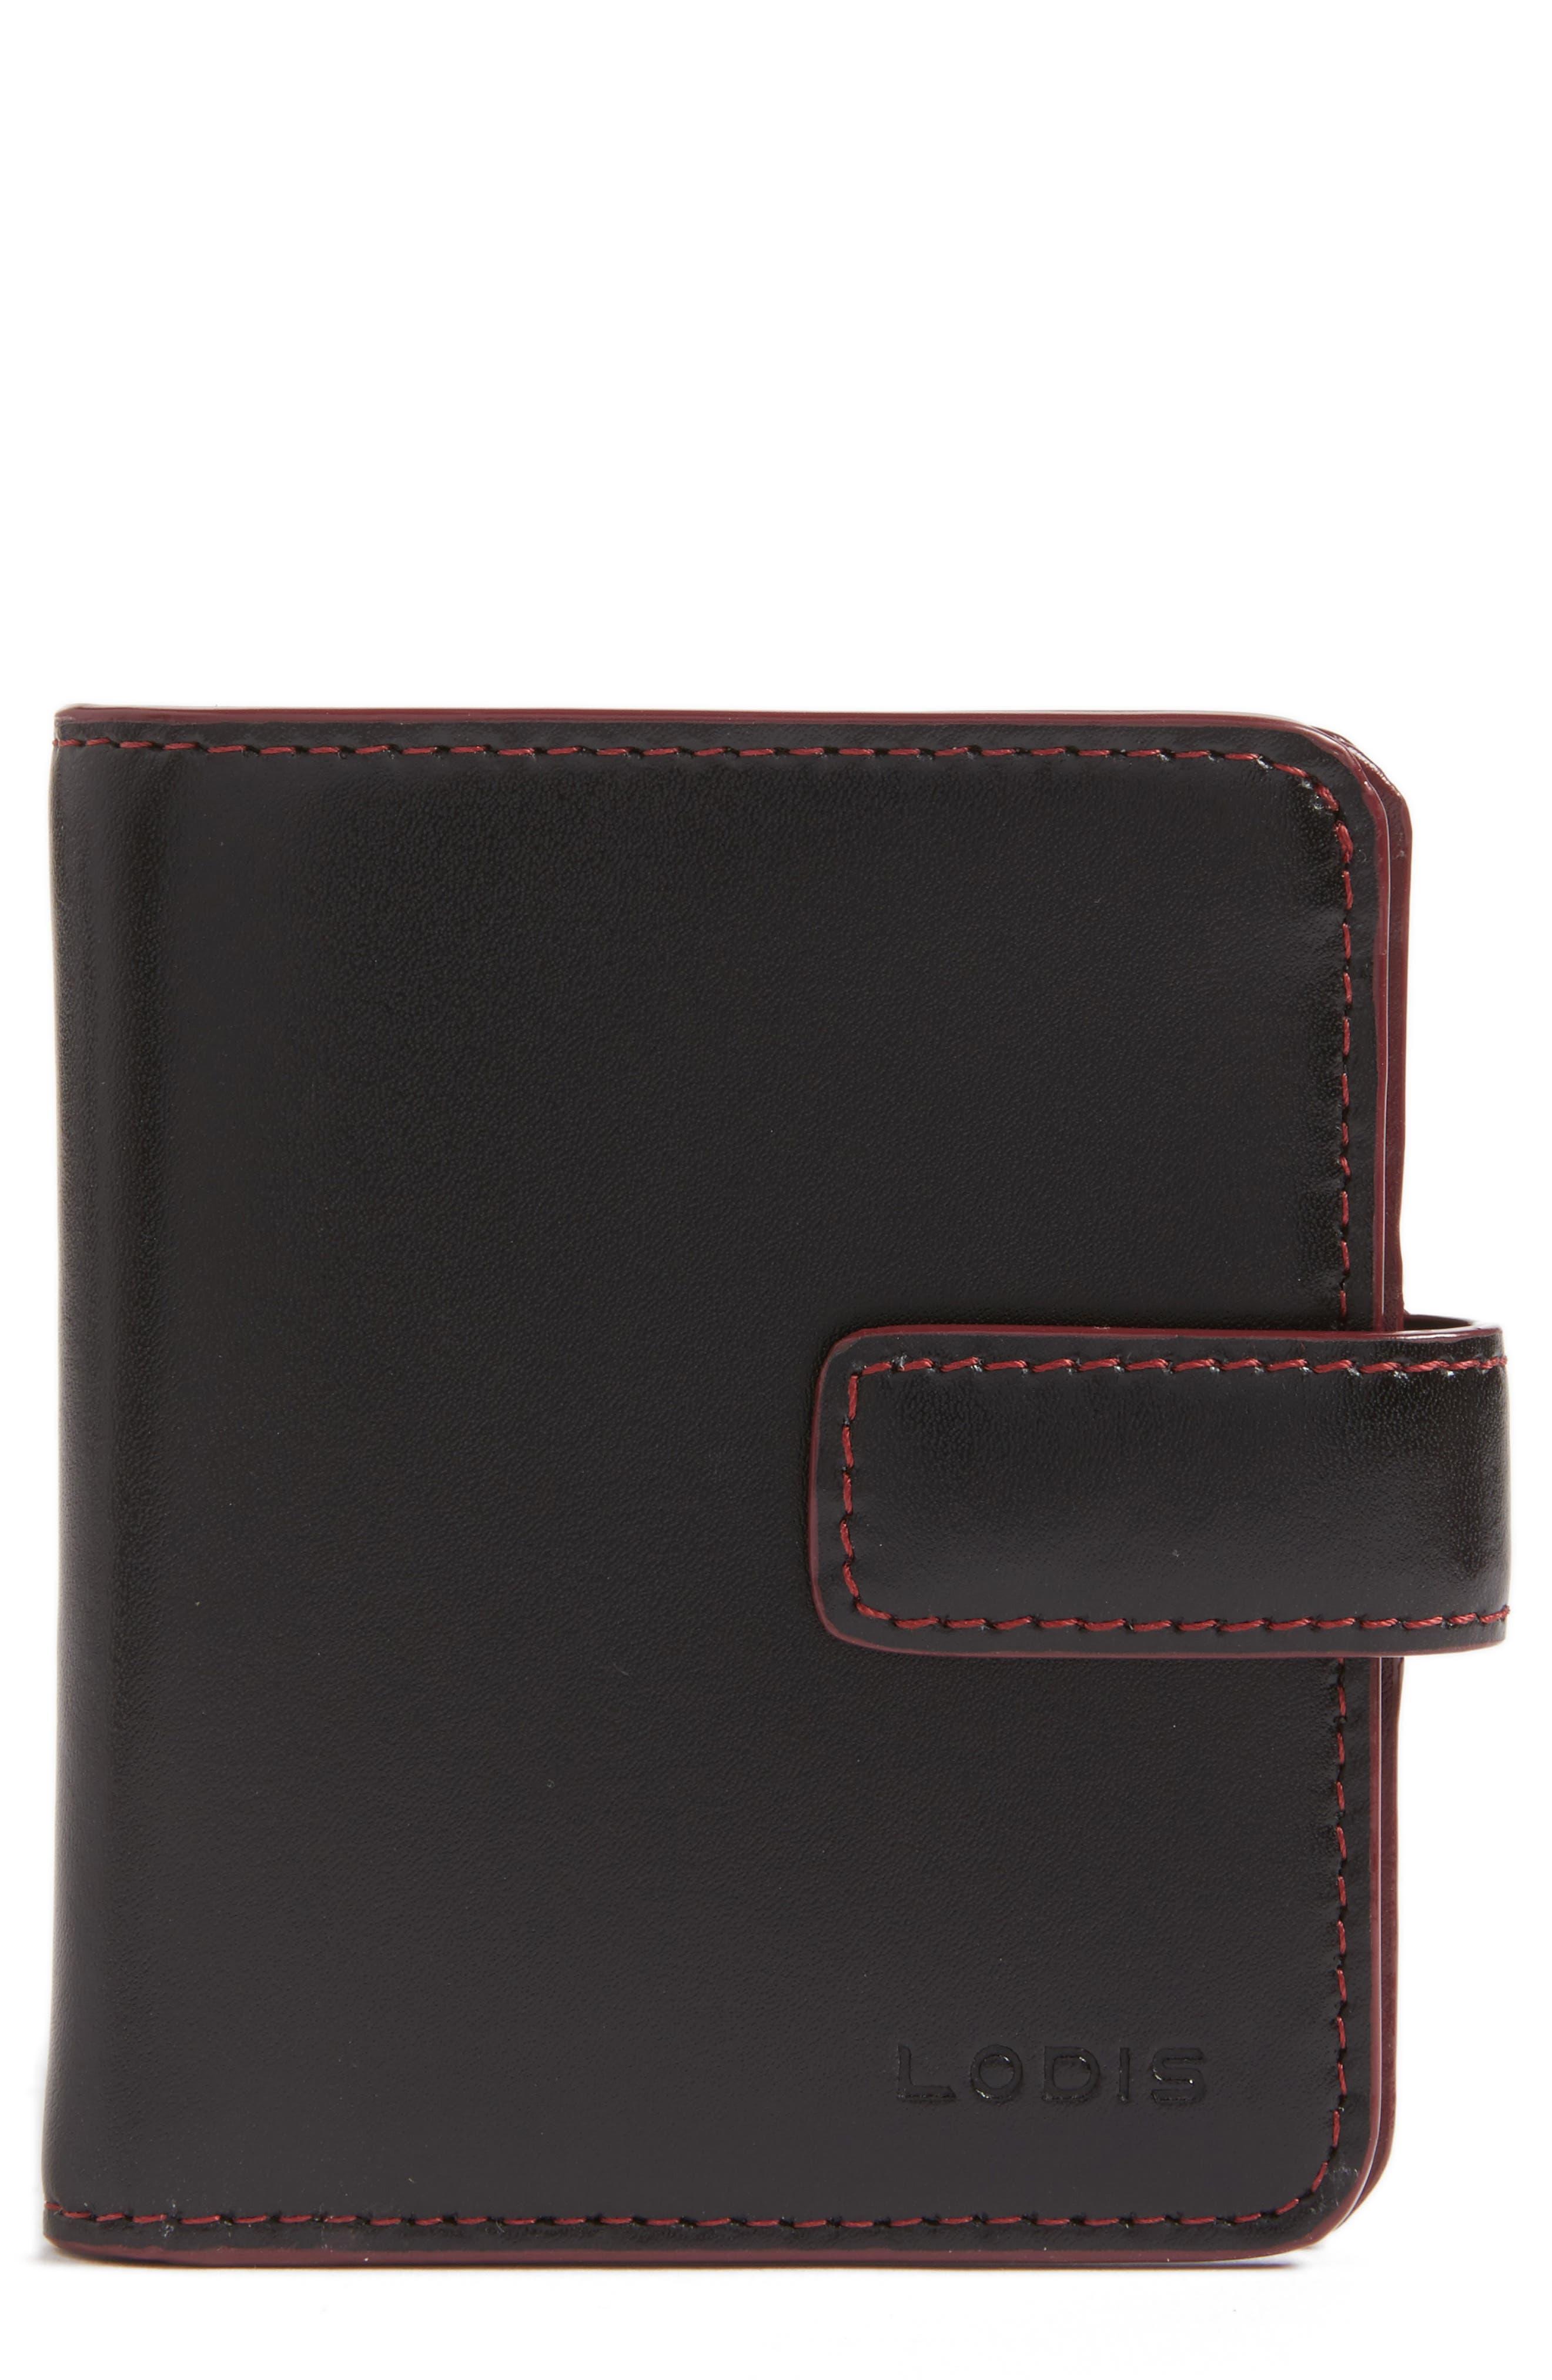 Lodis Petite Audrey RFID Leather Wallet,                         Main,                         color,